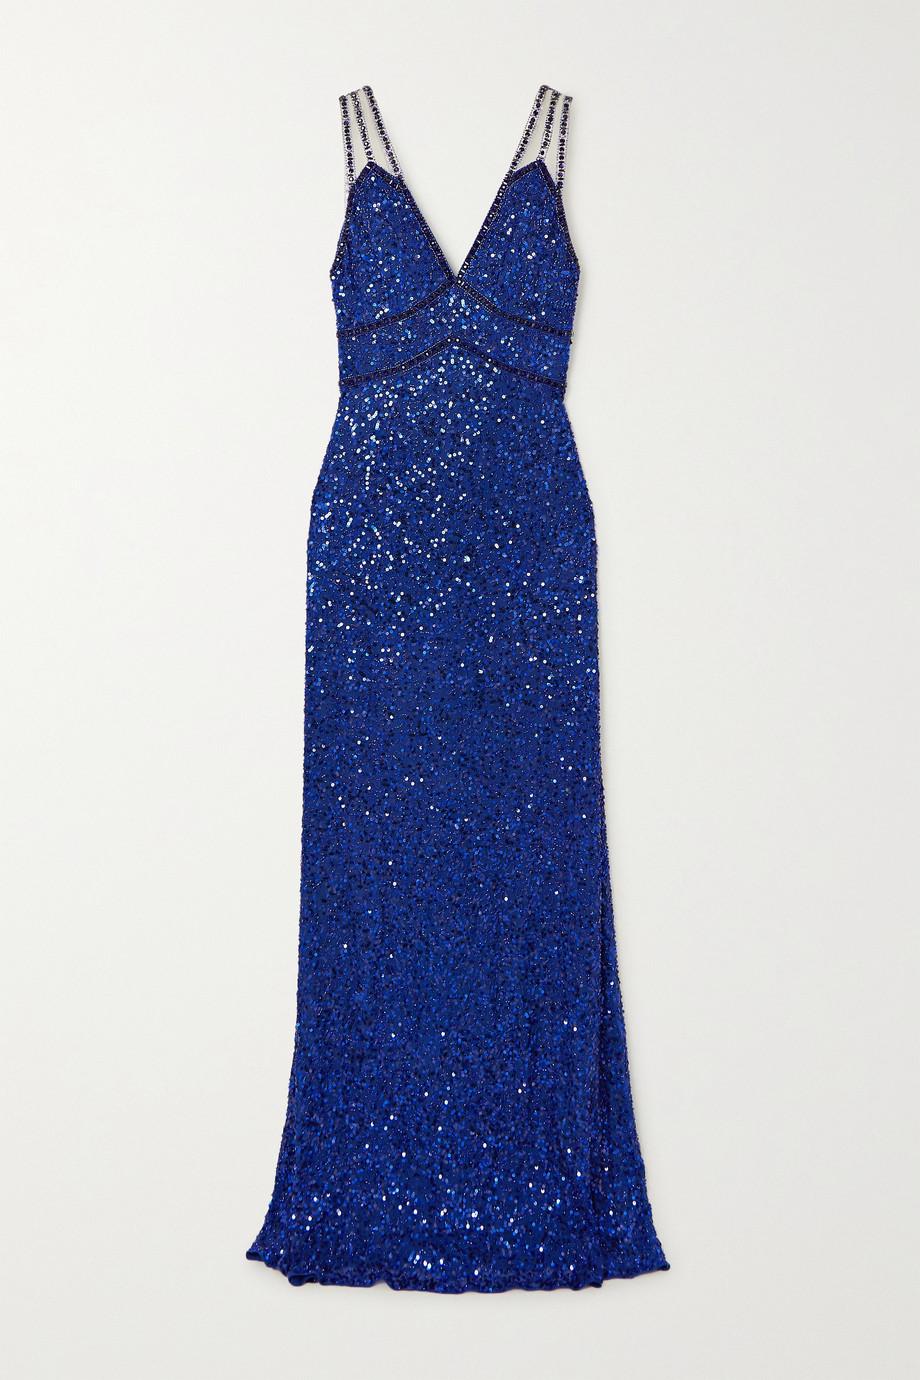 Jenny Packham Leya tulle-trimmed embellished chiffon gown